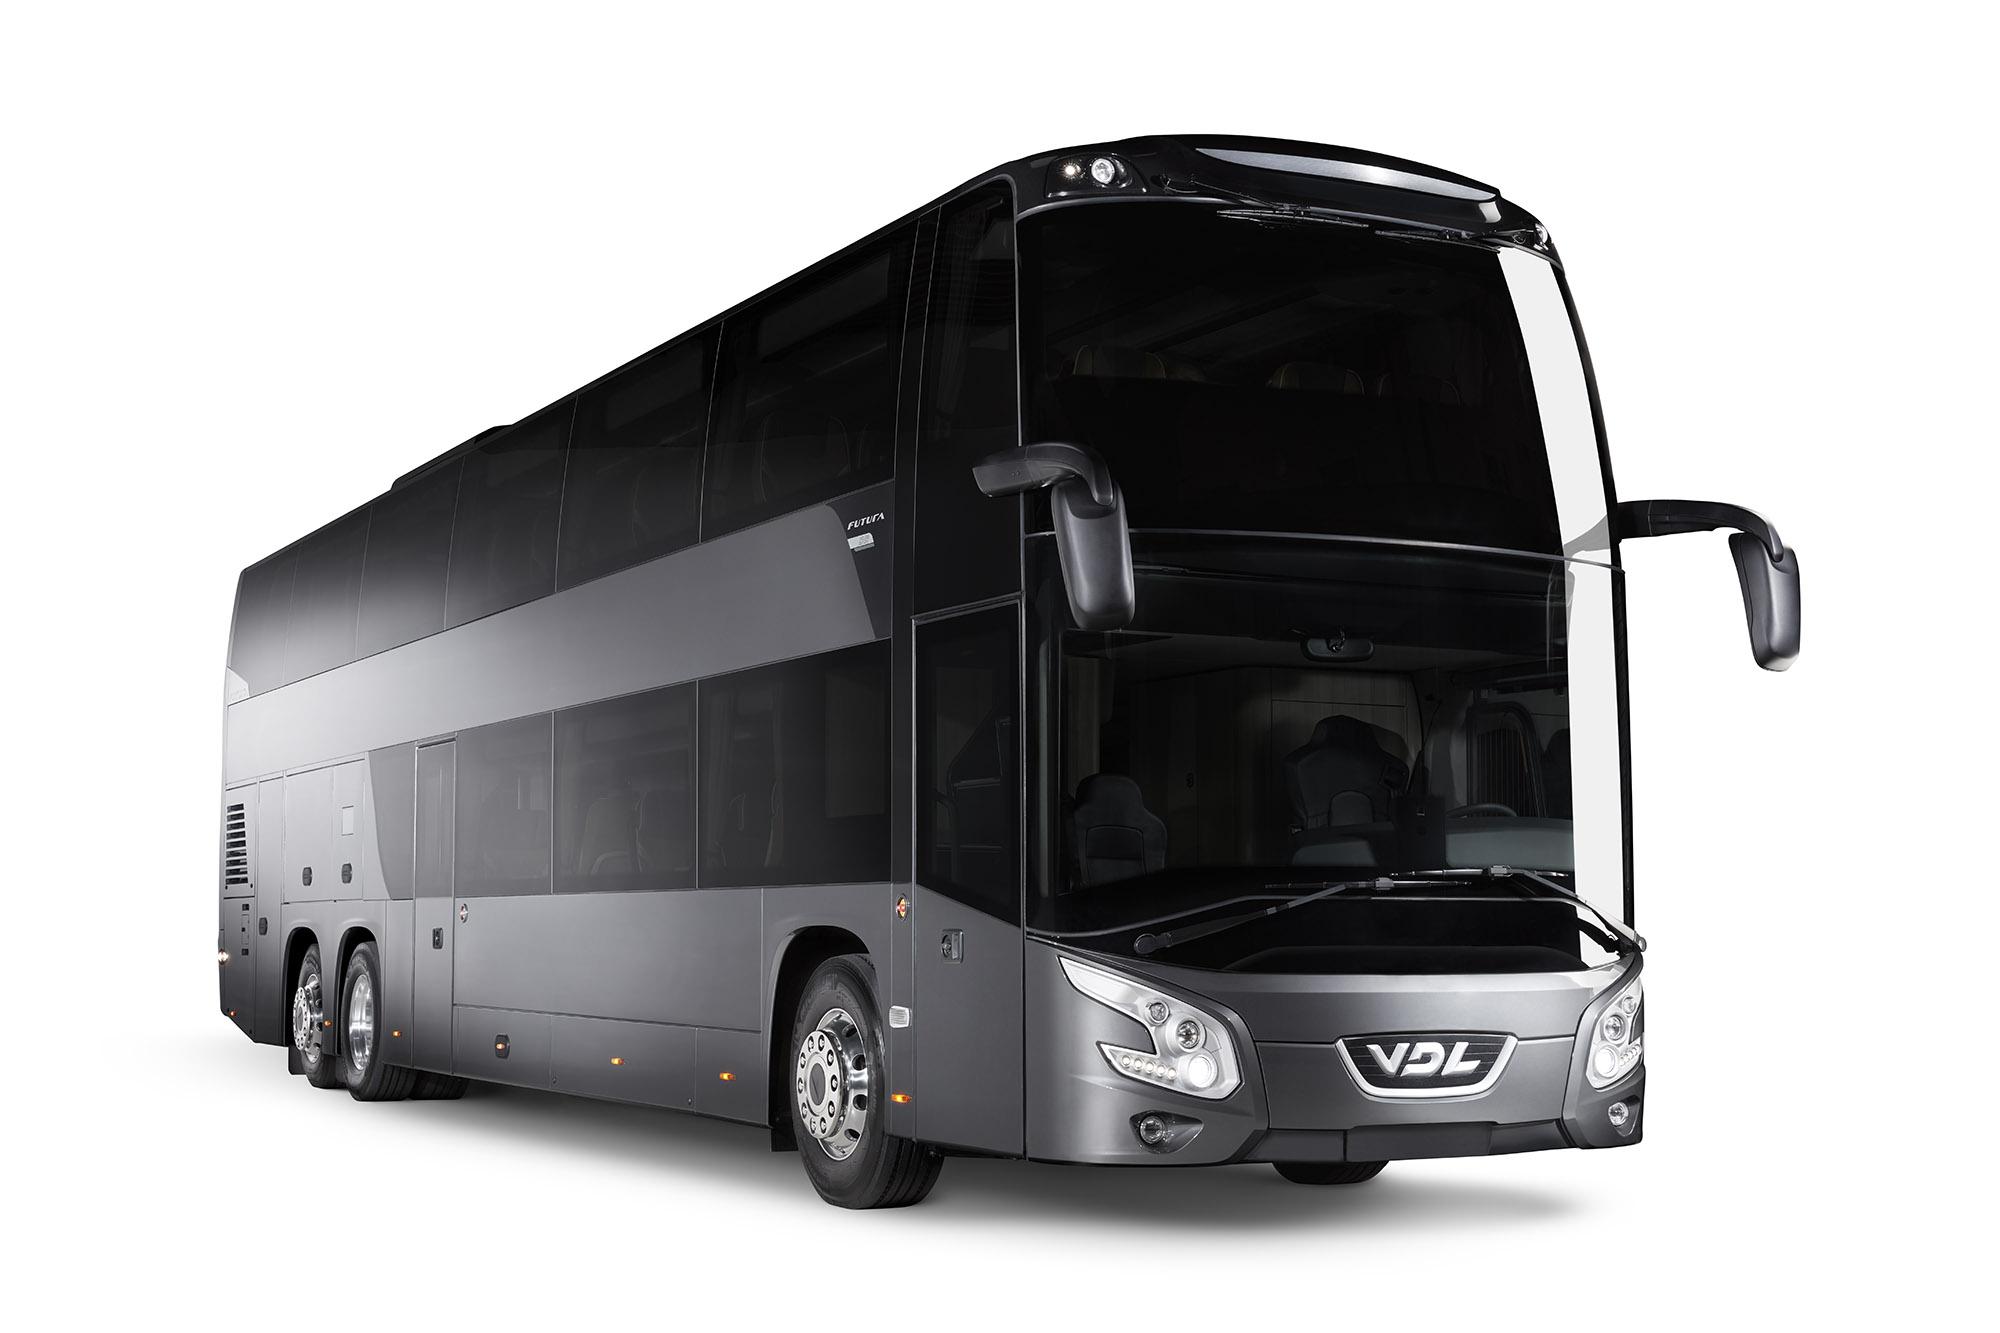 Futura range VDL bus & coach SPUISERS fotografie - FDD 2 Furtura